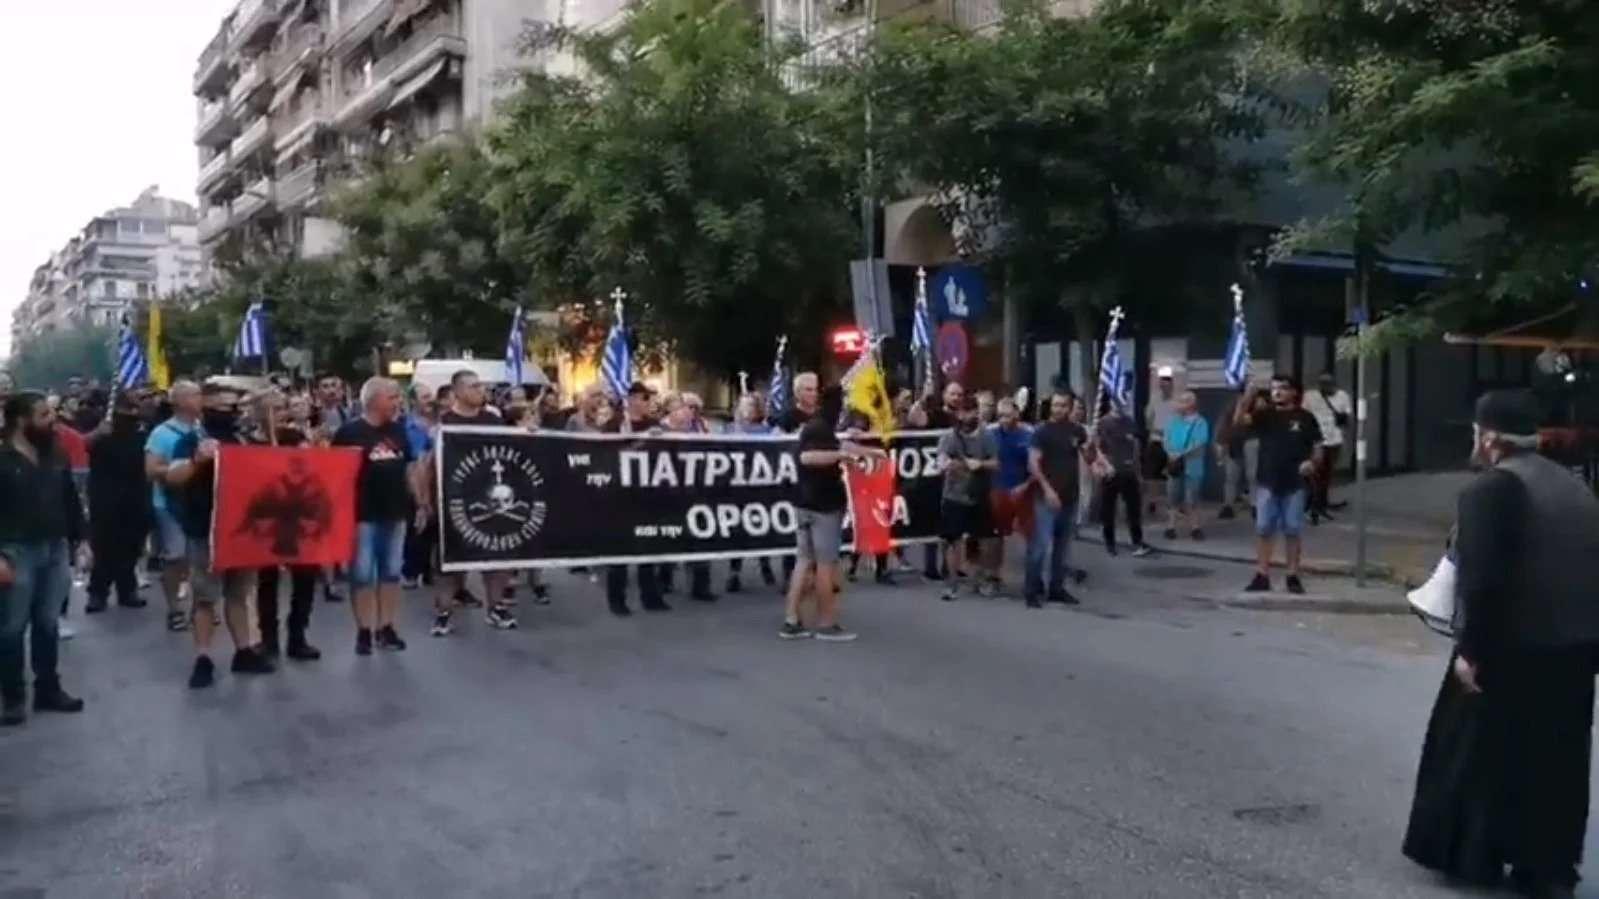 Yunanistan'da Ayasofya'nın Açılışı Protesto Edildi 2